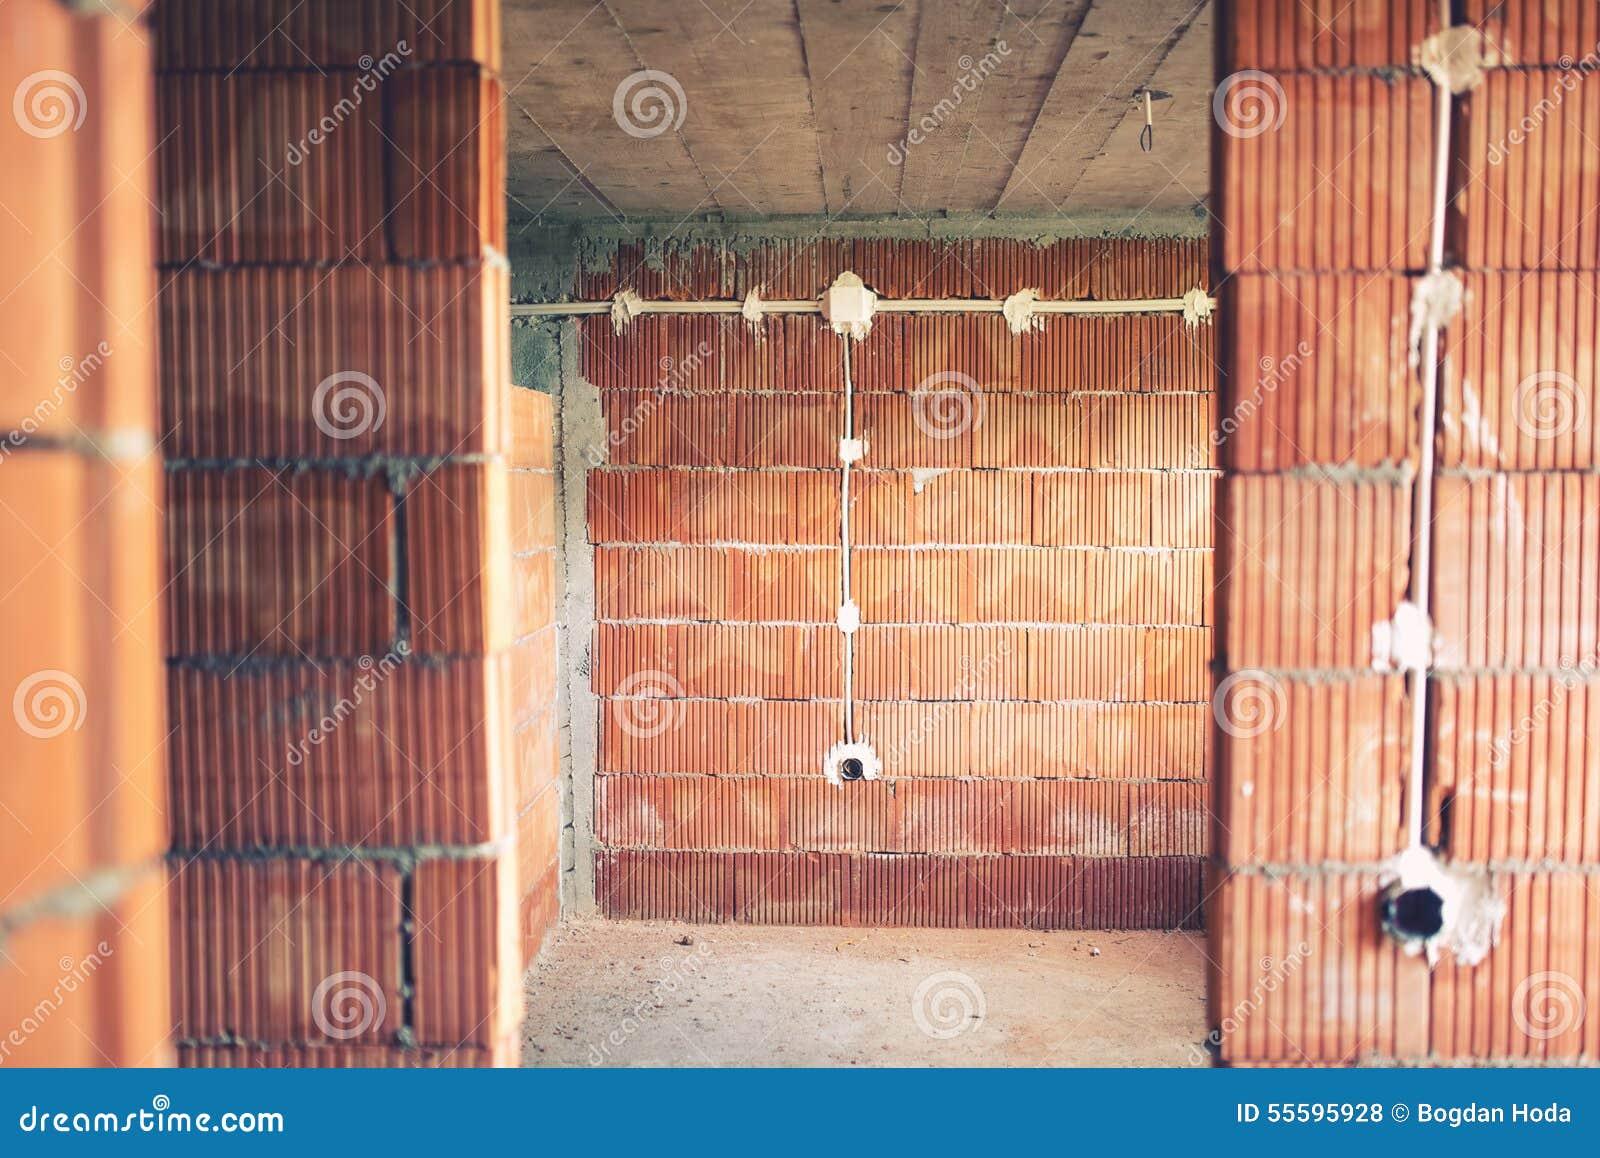 Installation de fils et tuyaux lectriques de l - Cambiar instalacion electrica sin rozas ...